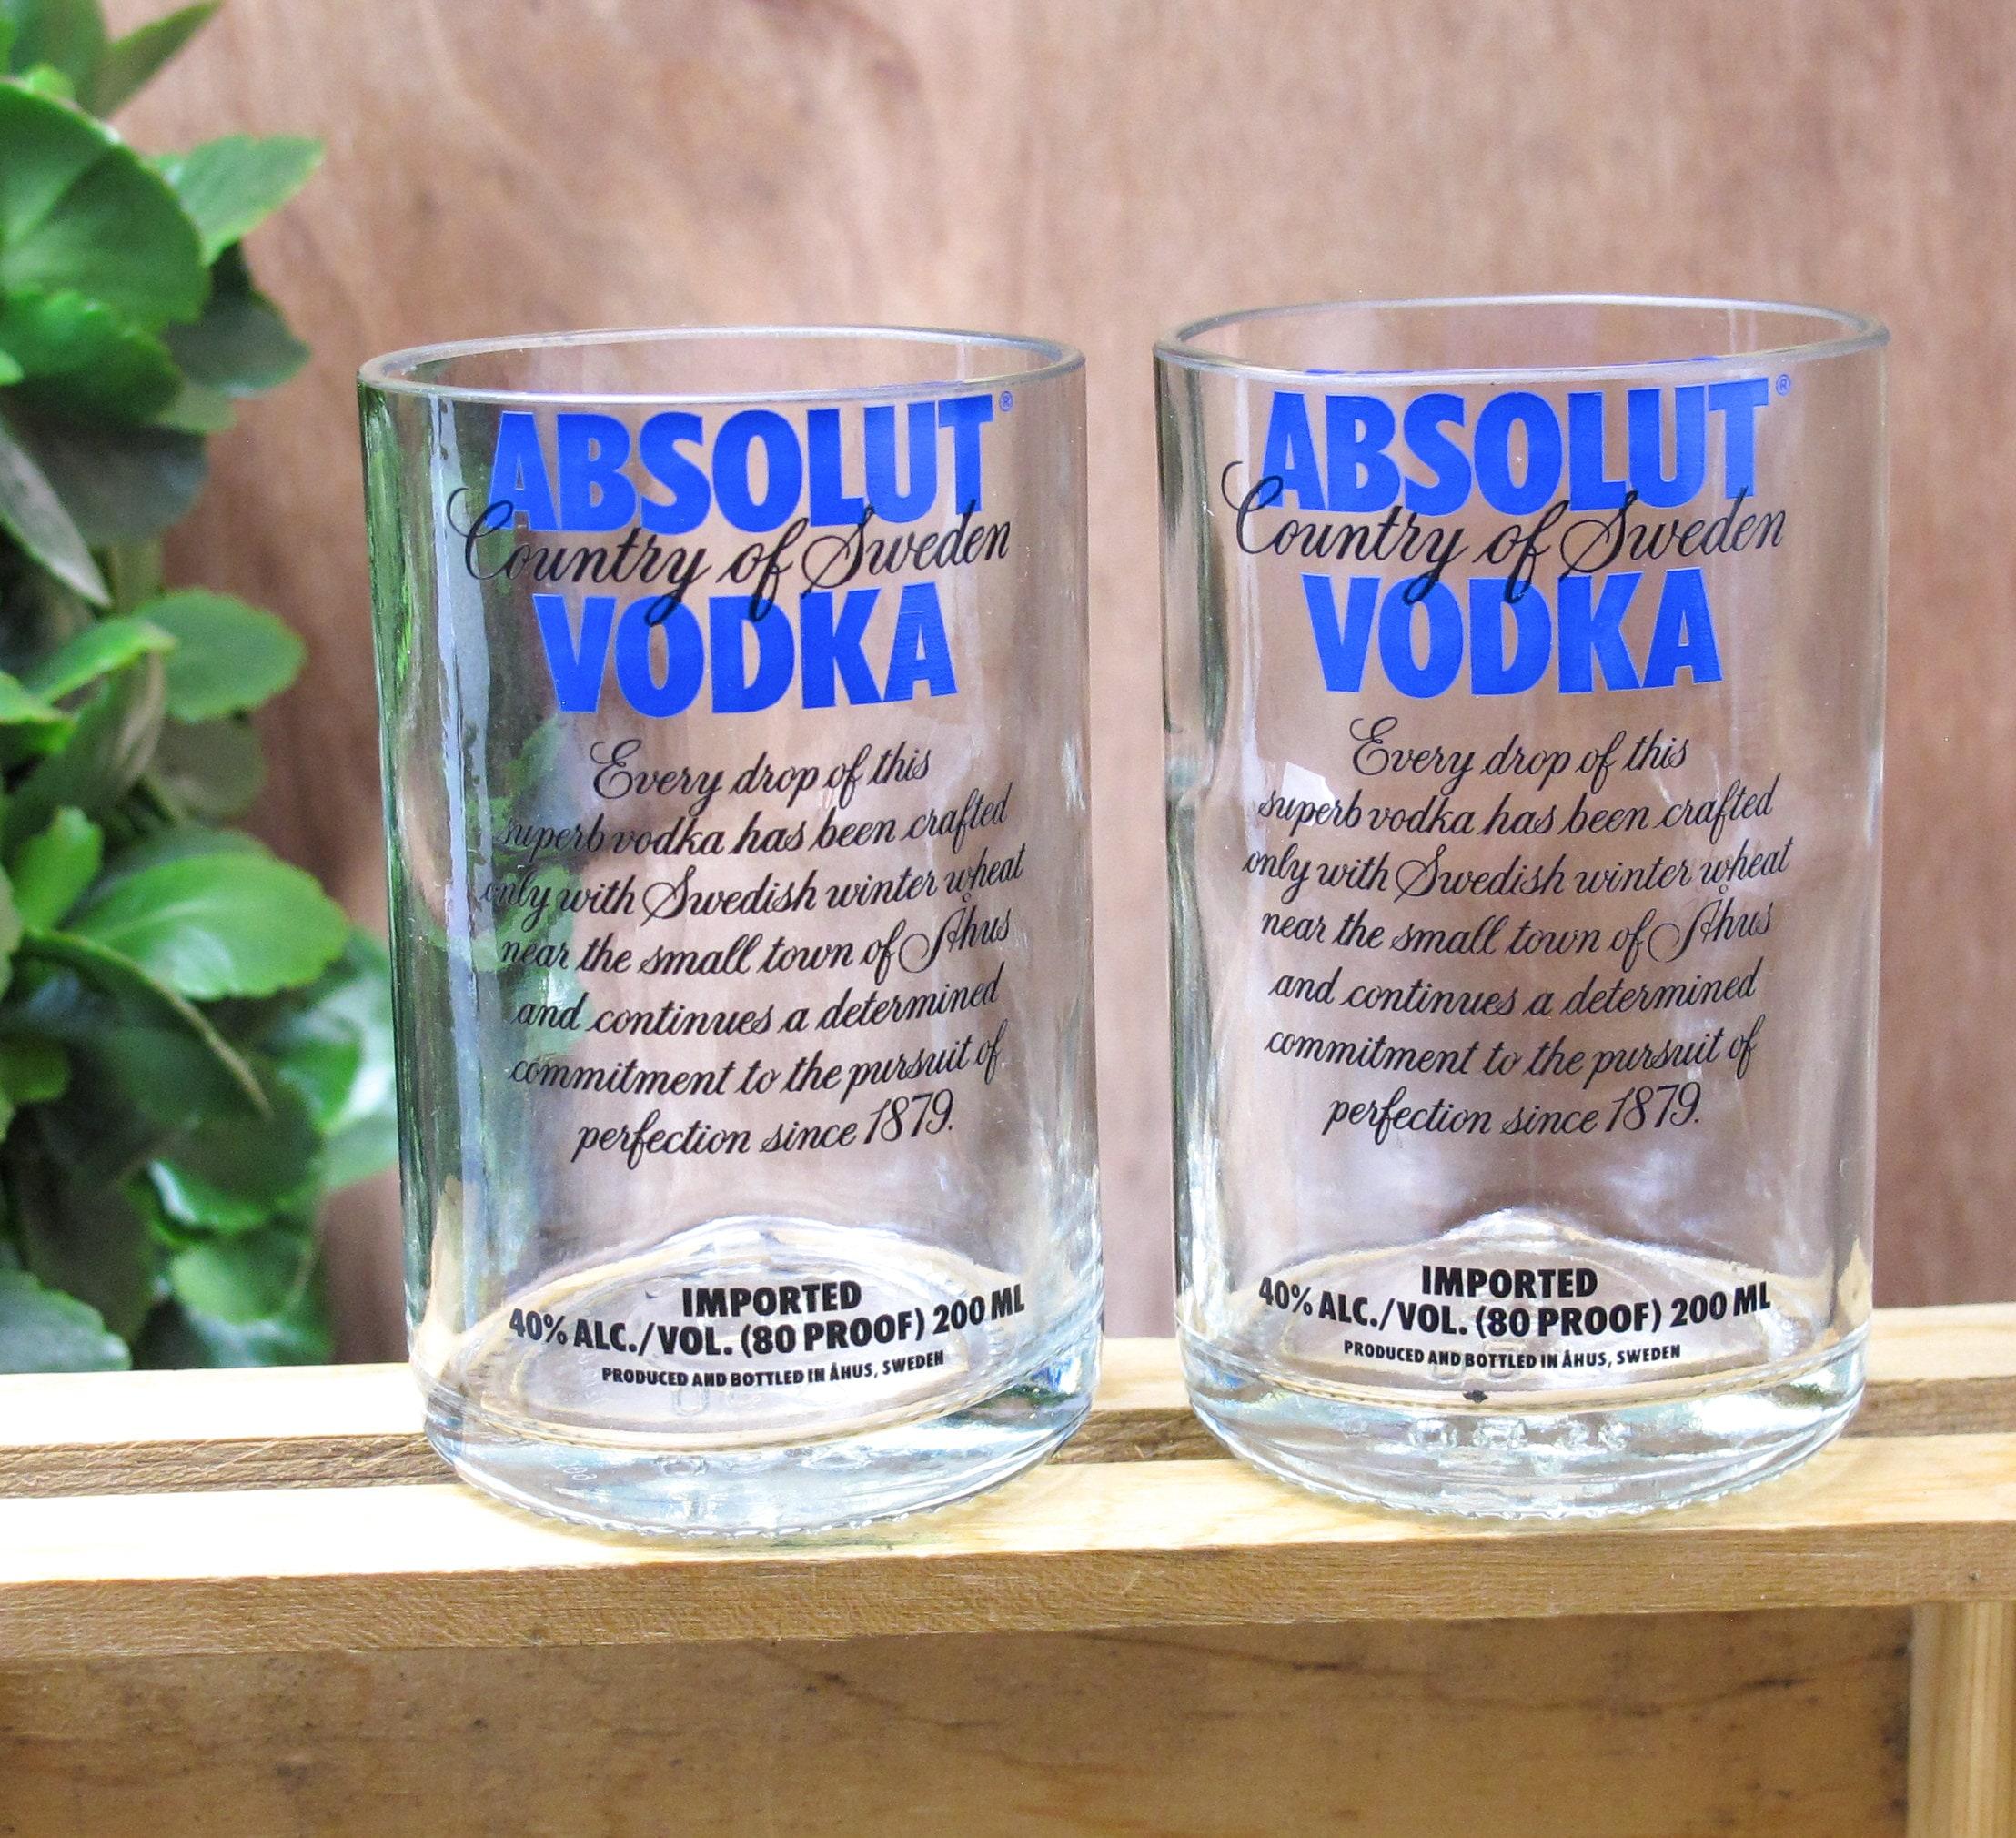 Wodka Themen Geschenk Absolut Vodka Tabelle doppelte Wodka | Etsy